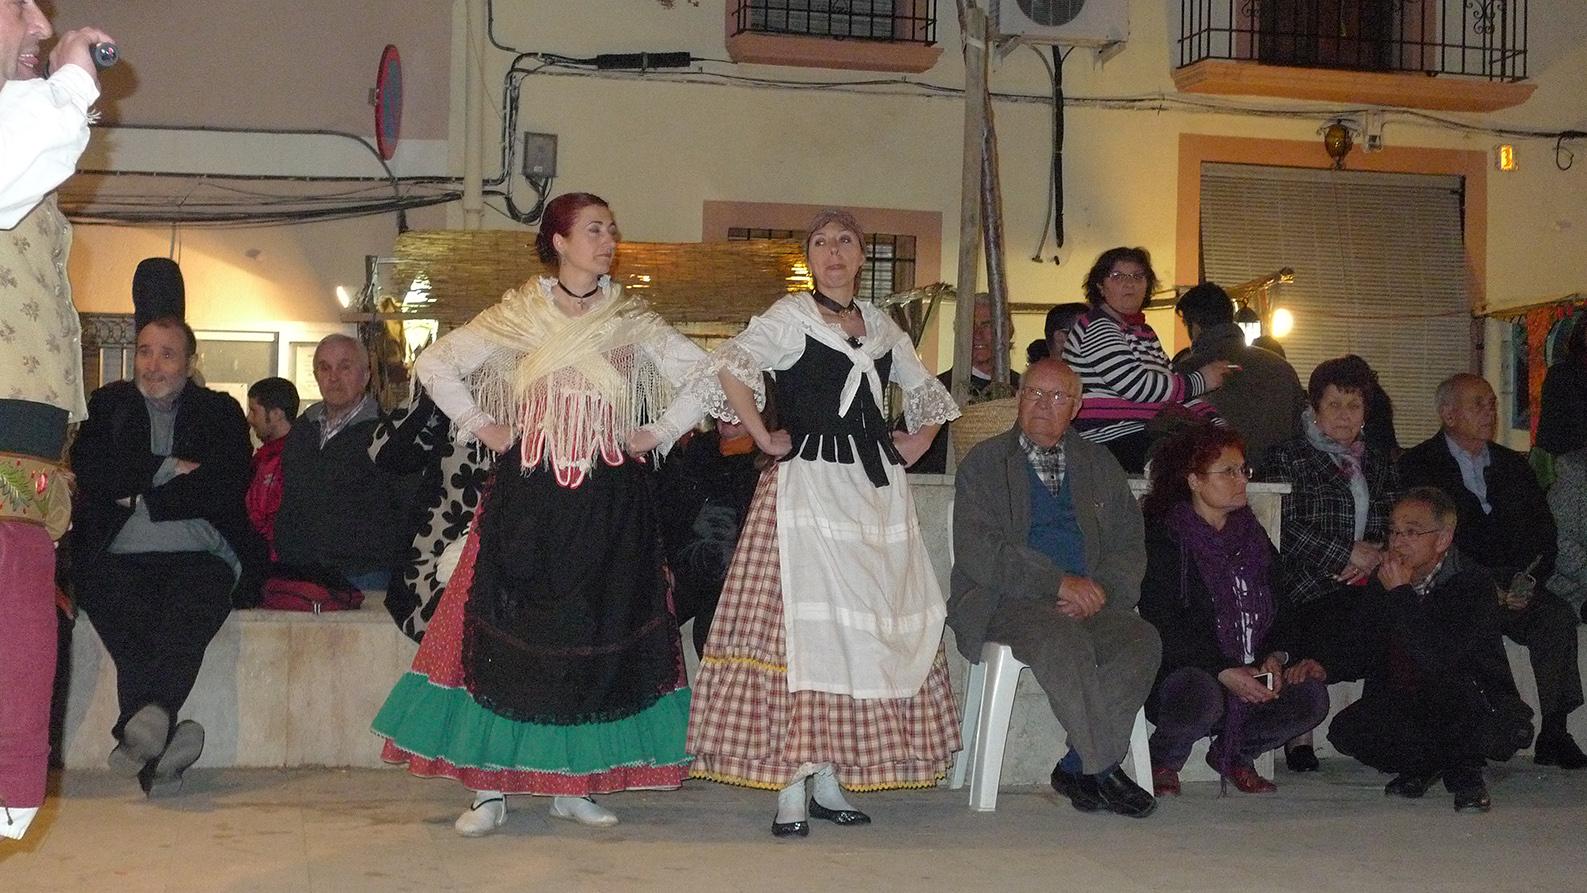 2014-02-23 - Baladre a Fira St. Marcia-ROTOVA (199)